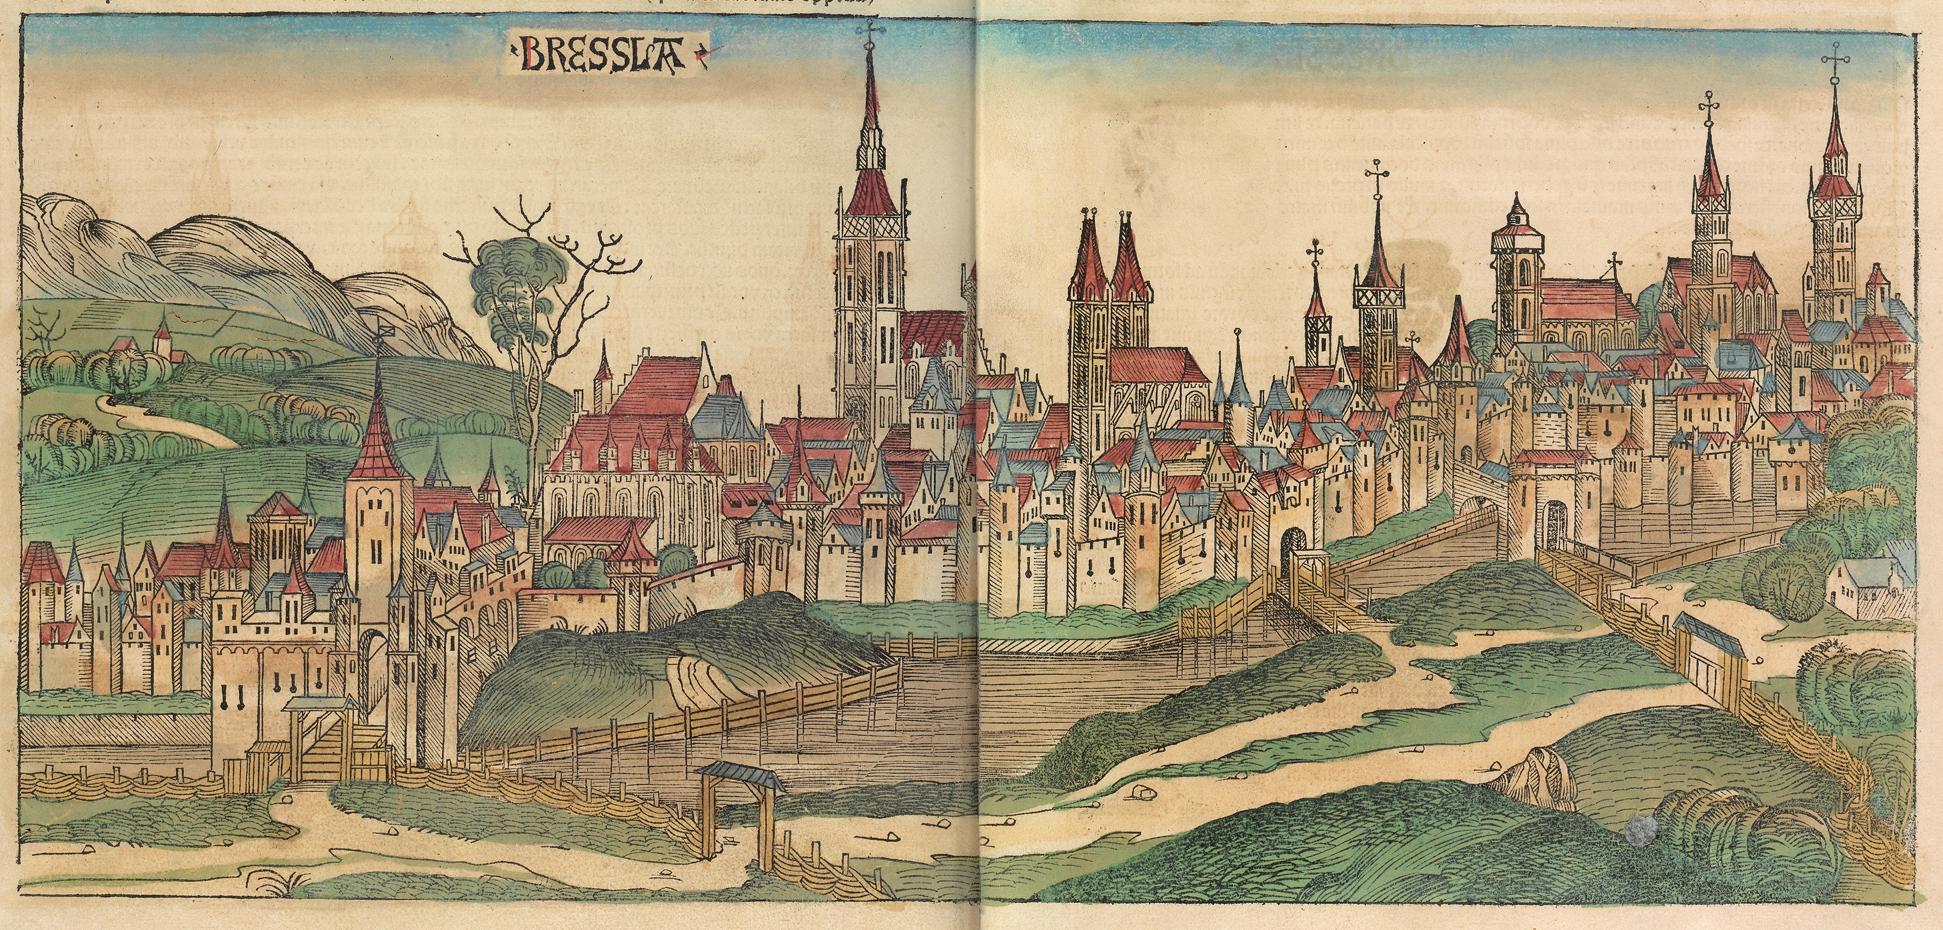 https://upload.wikimedia.org/wikipedia/commons/8/83/Nuremberg_chronicles_-_BRESSLA.png